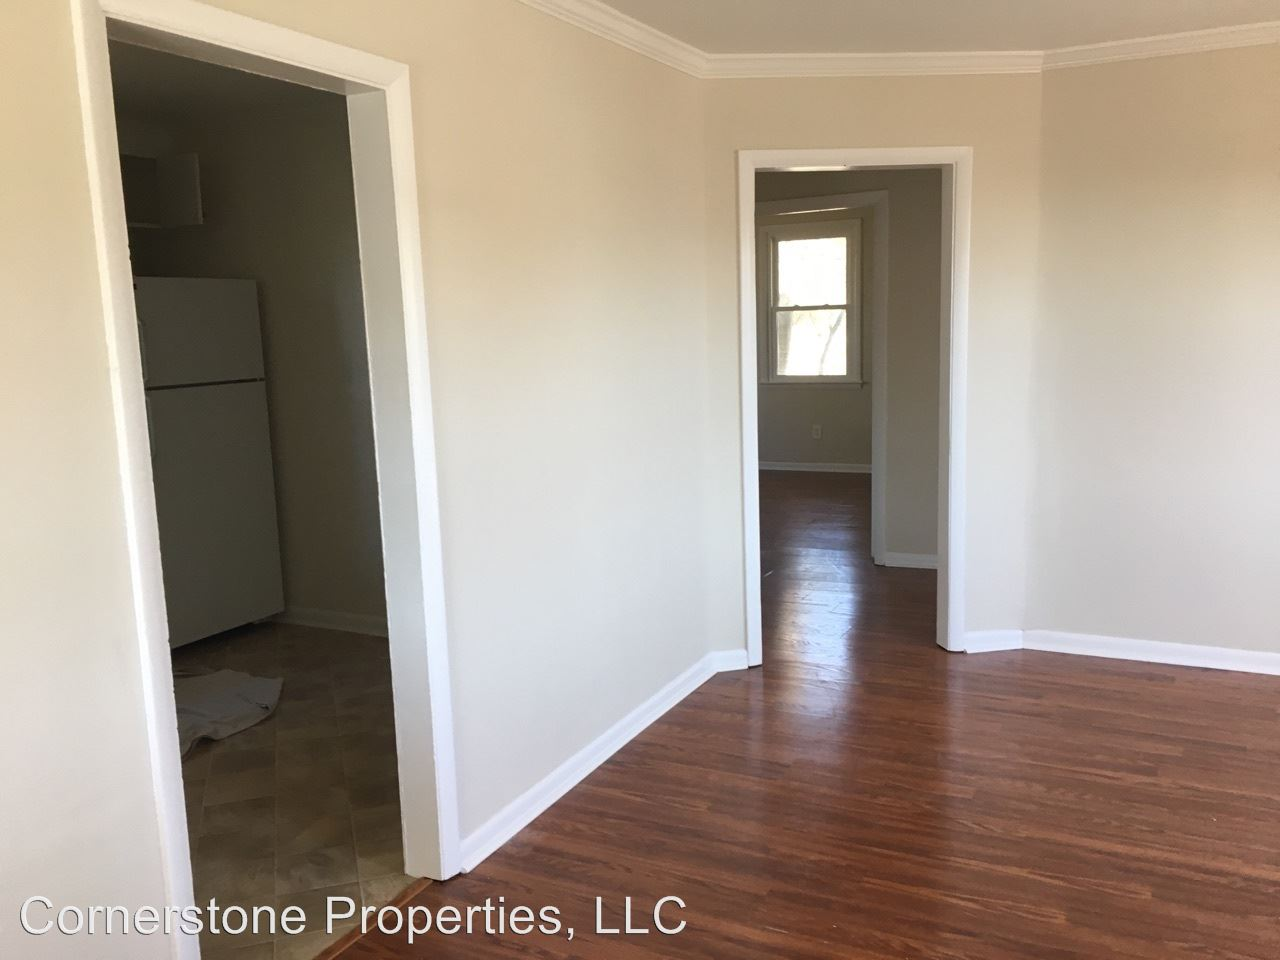 Similar Apartment at 108 Keeton Ave.